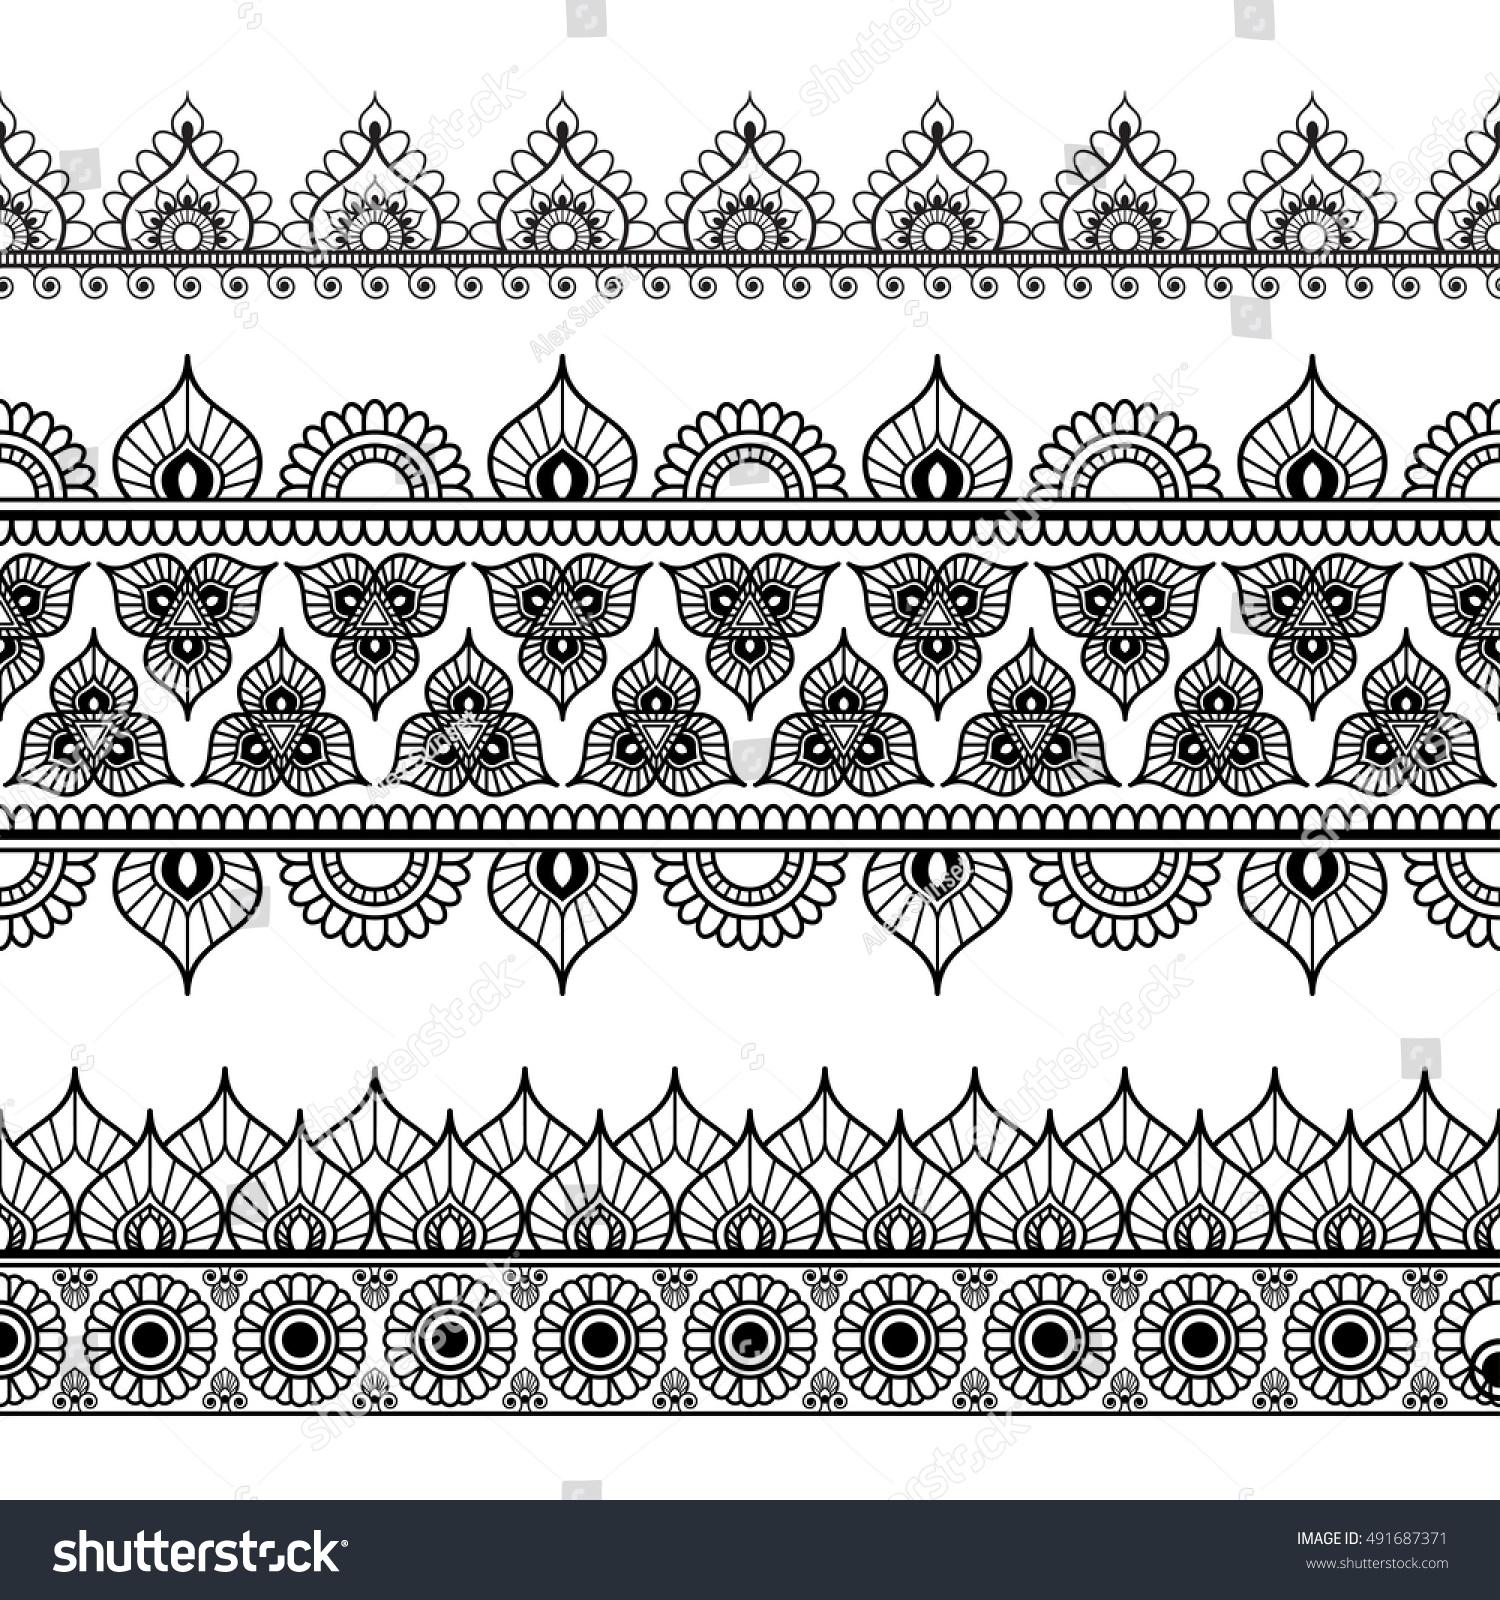 Border Line Lace Mehndi Elements Indian Stock Illustration 491687371